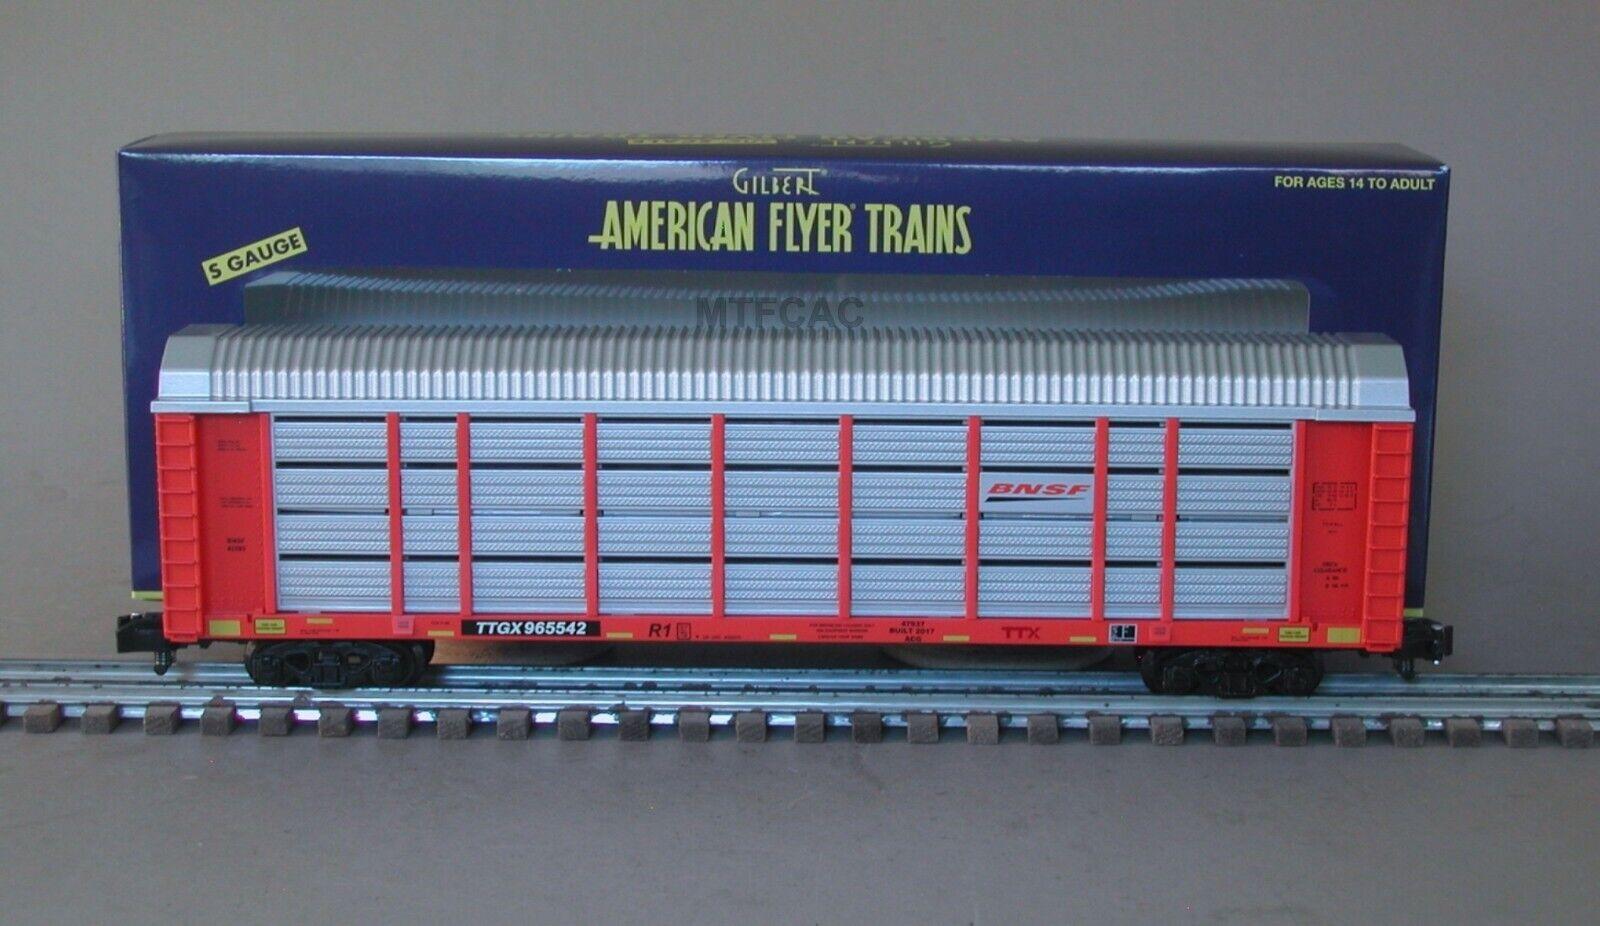 American Flyer 6-47937 BNSF Auto autorier by Lionel TTGX 965542